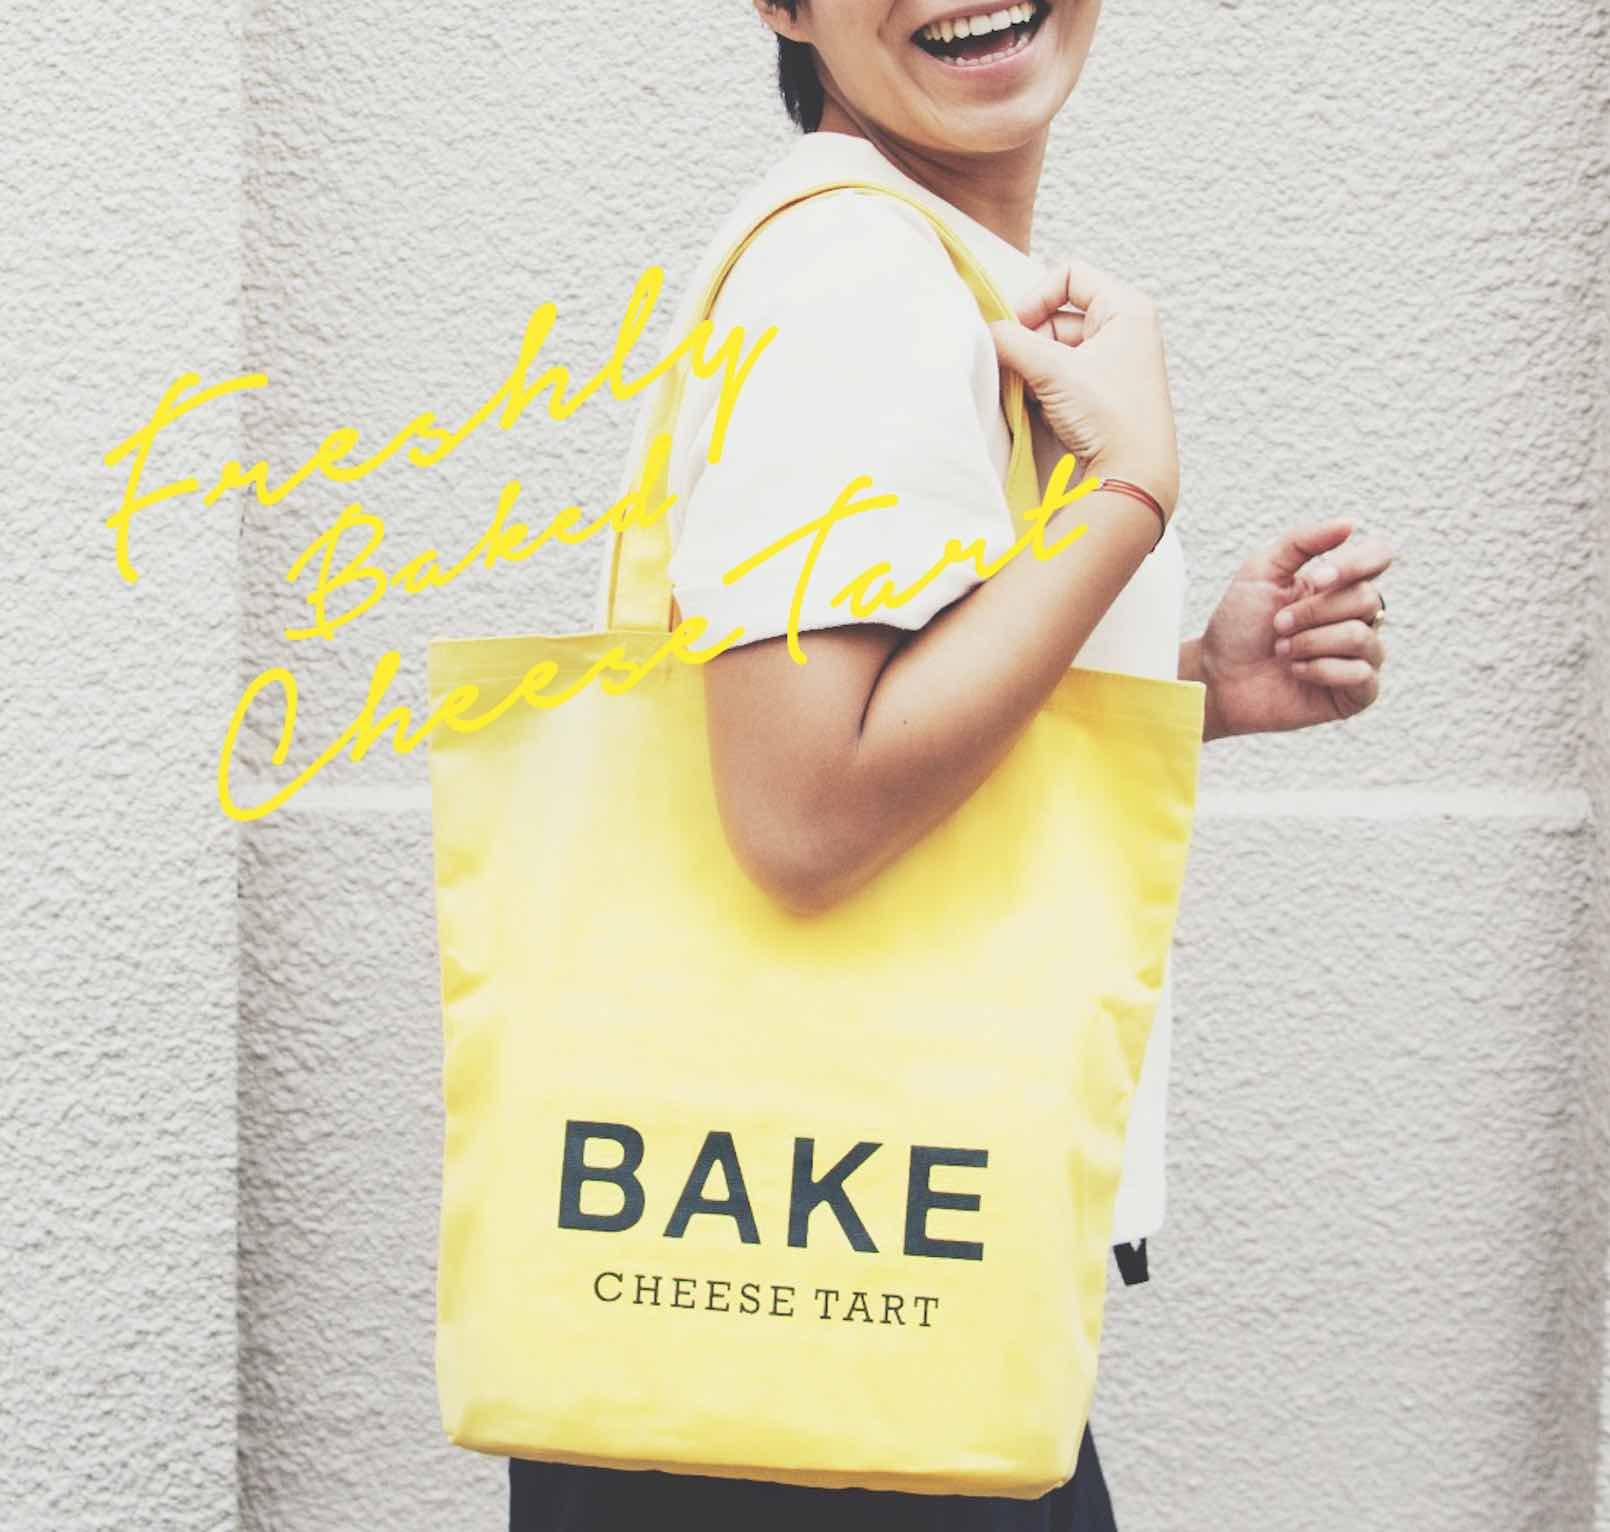 bake-cheese-tart-tote-bags-aspirantsg